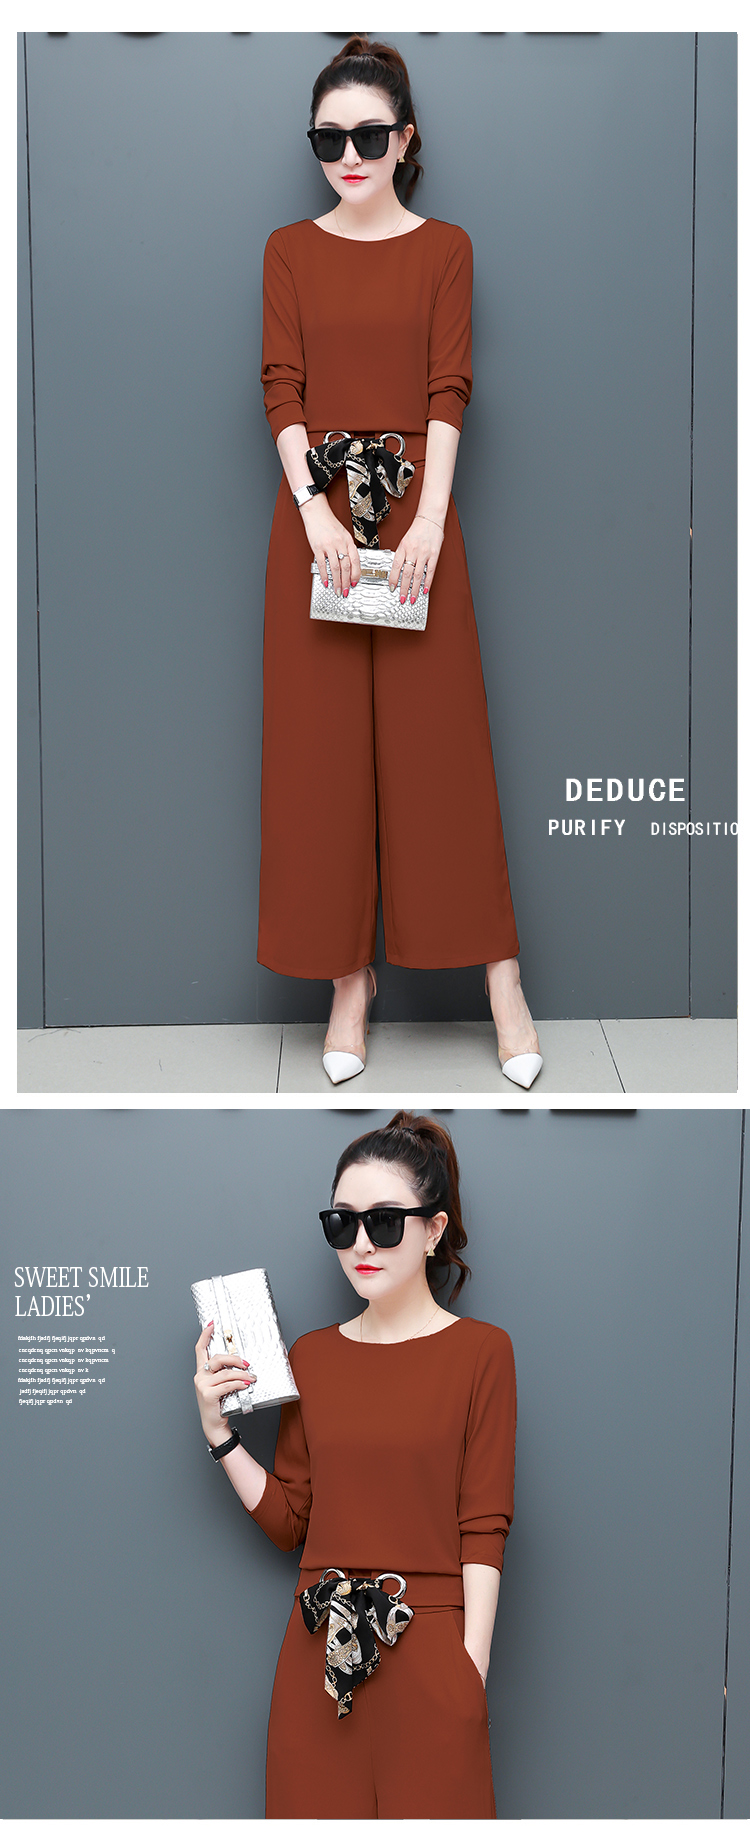 Chiffon 2 Piece Set Women Long Sleeve Tops And Wide Leg Pants Trousers Set Suits Spring Autumn Casual Office Elegant Women's Set 17